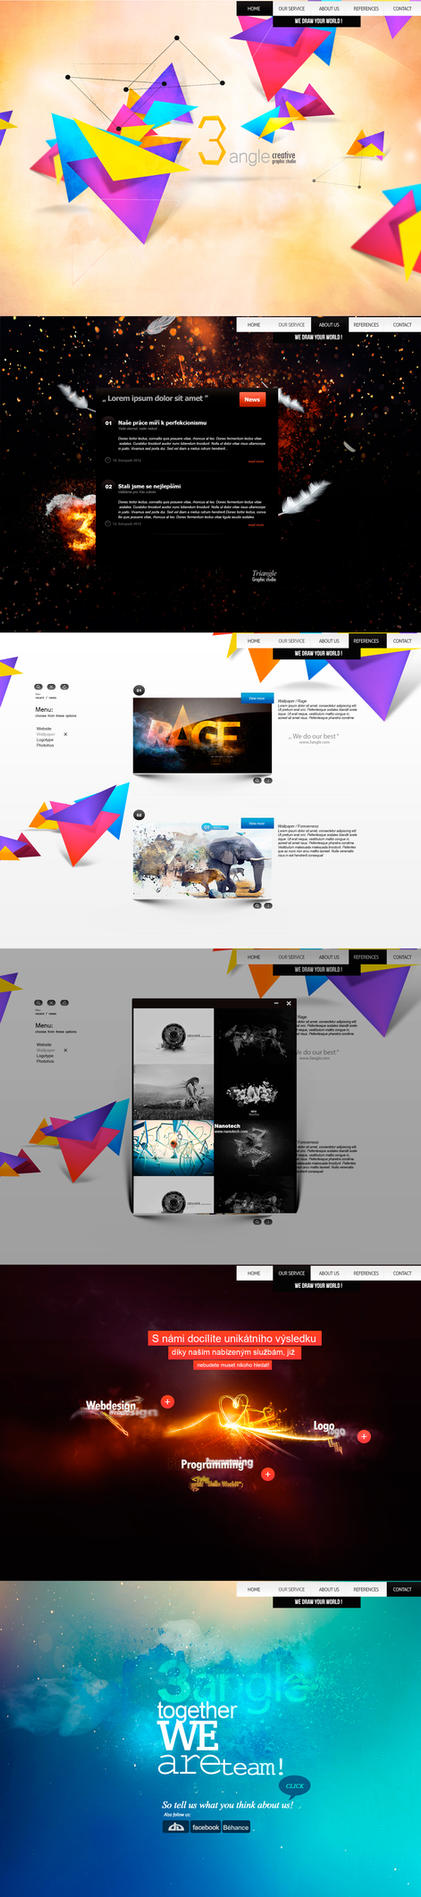 3angle creative graphic studio by ArsiZyr